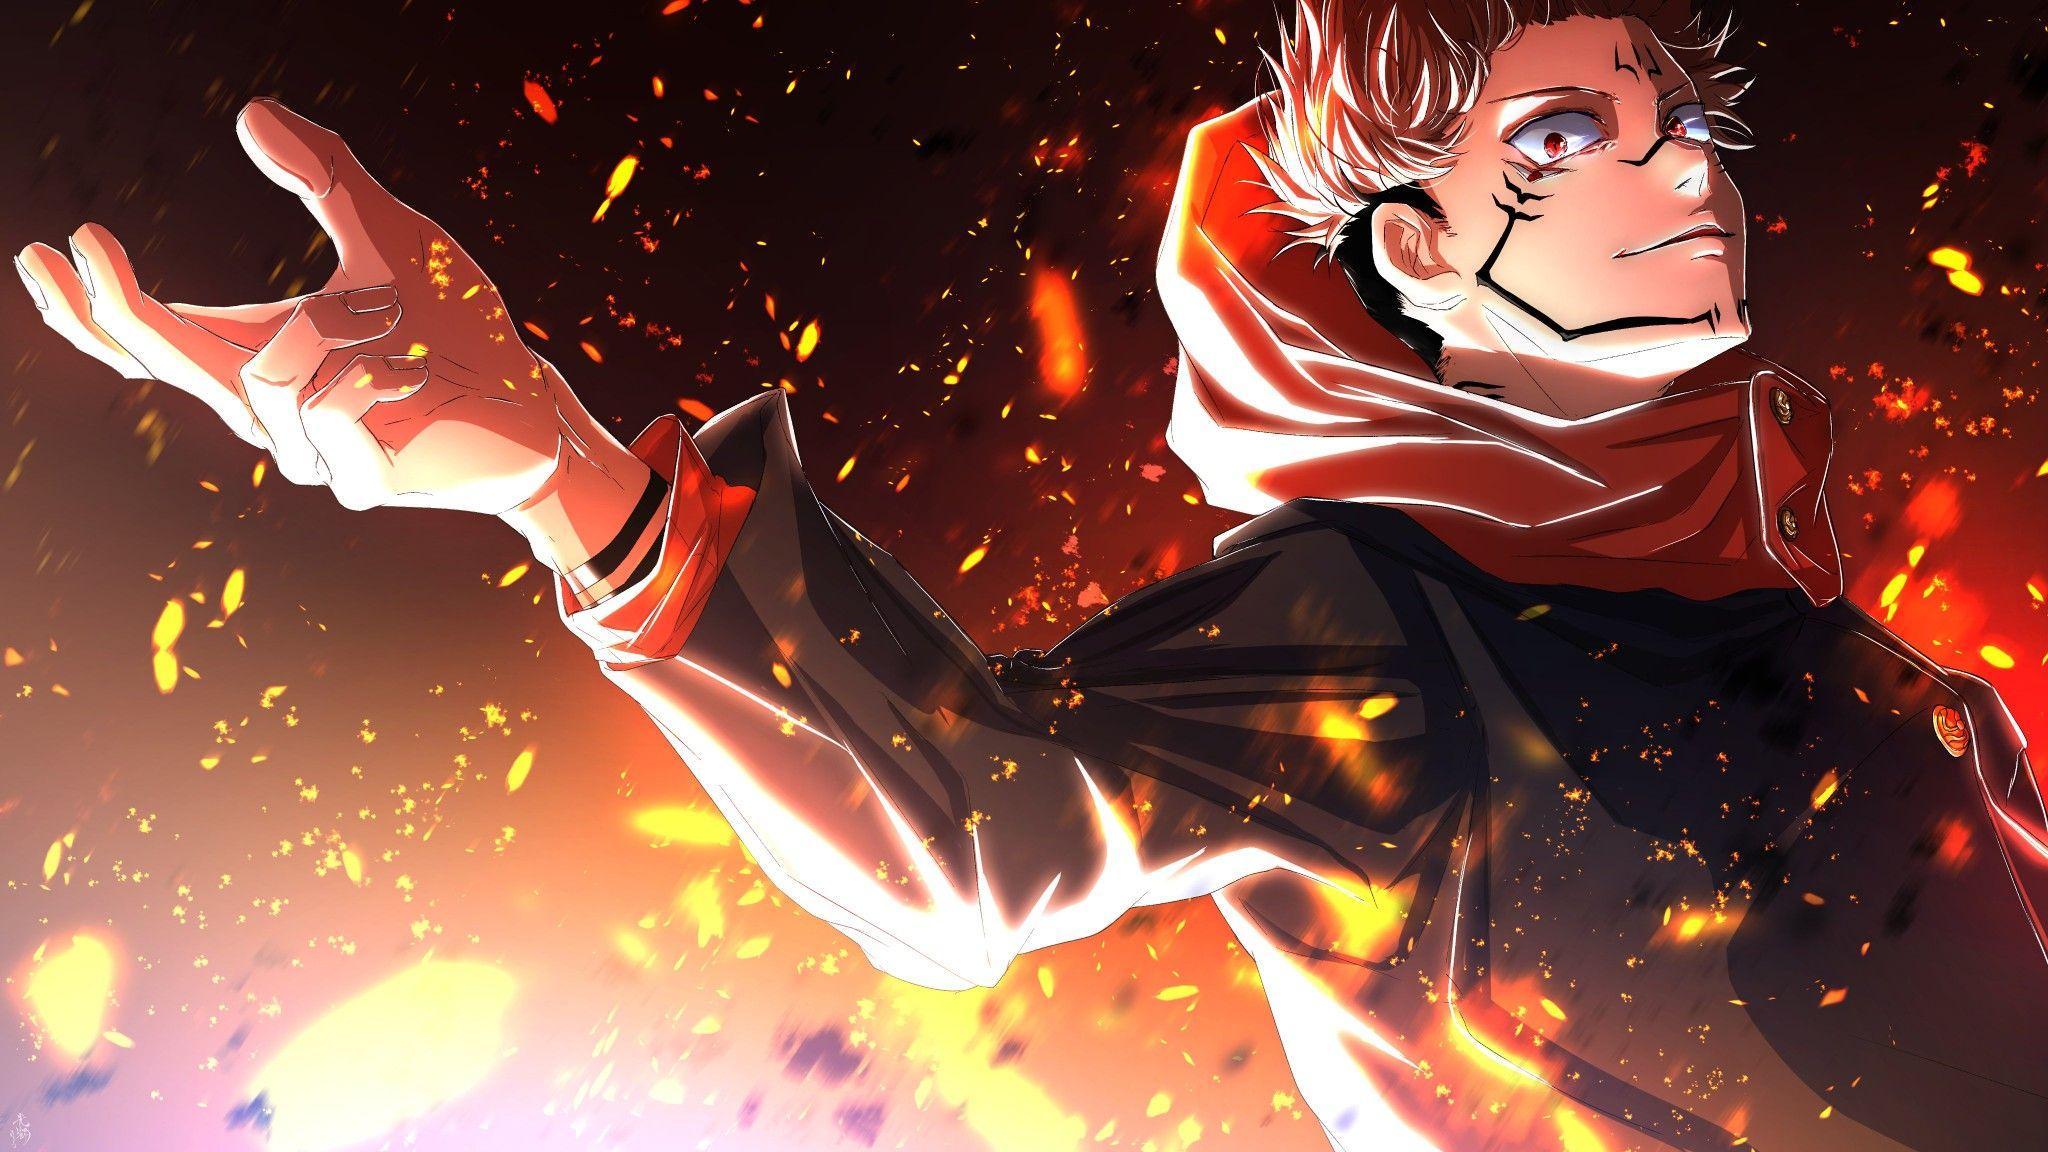 Save Follow Jujutsu Kaisen In 2021 Anime Tapete Jujutsu Bilder